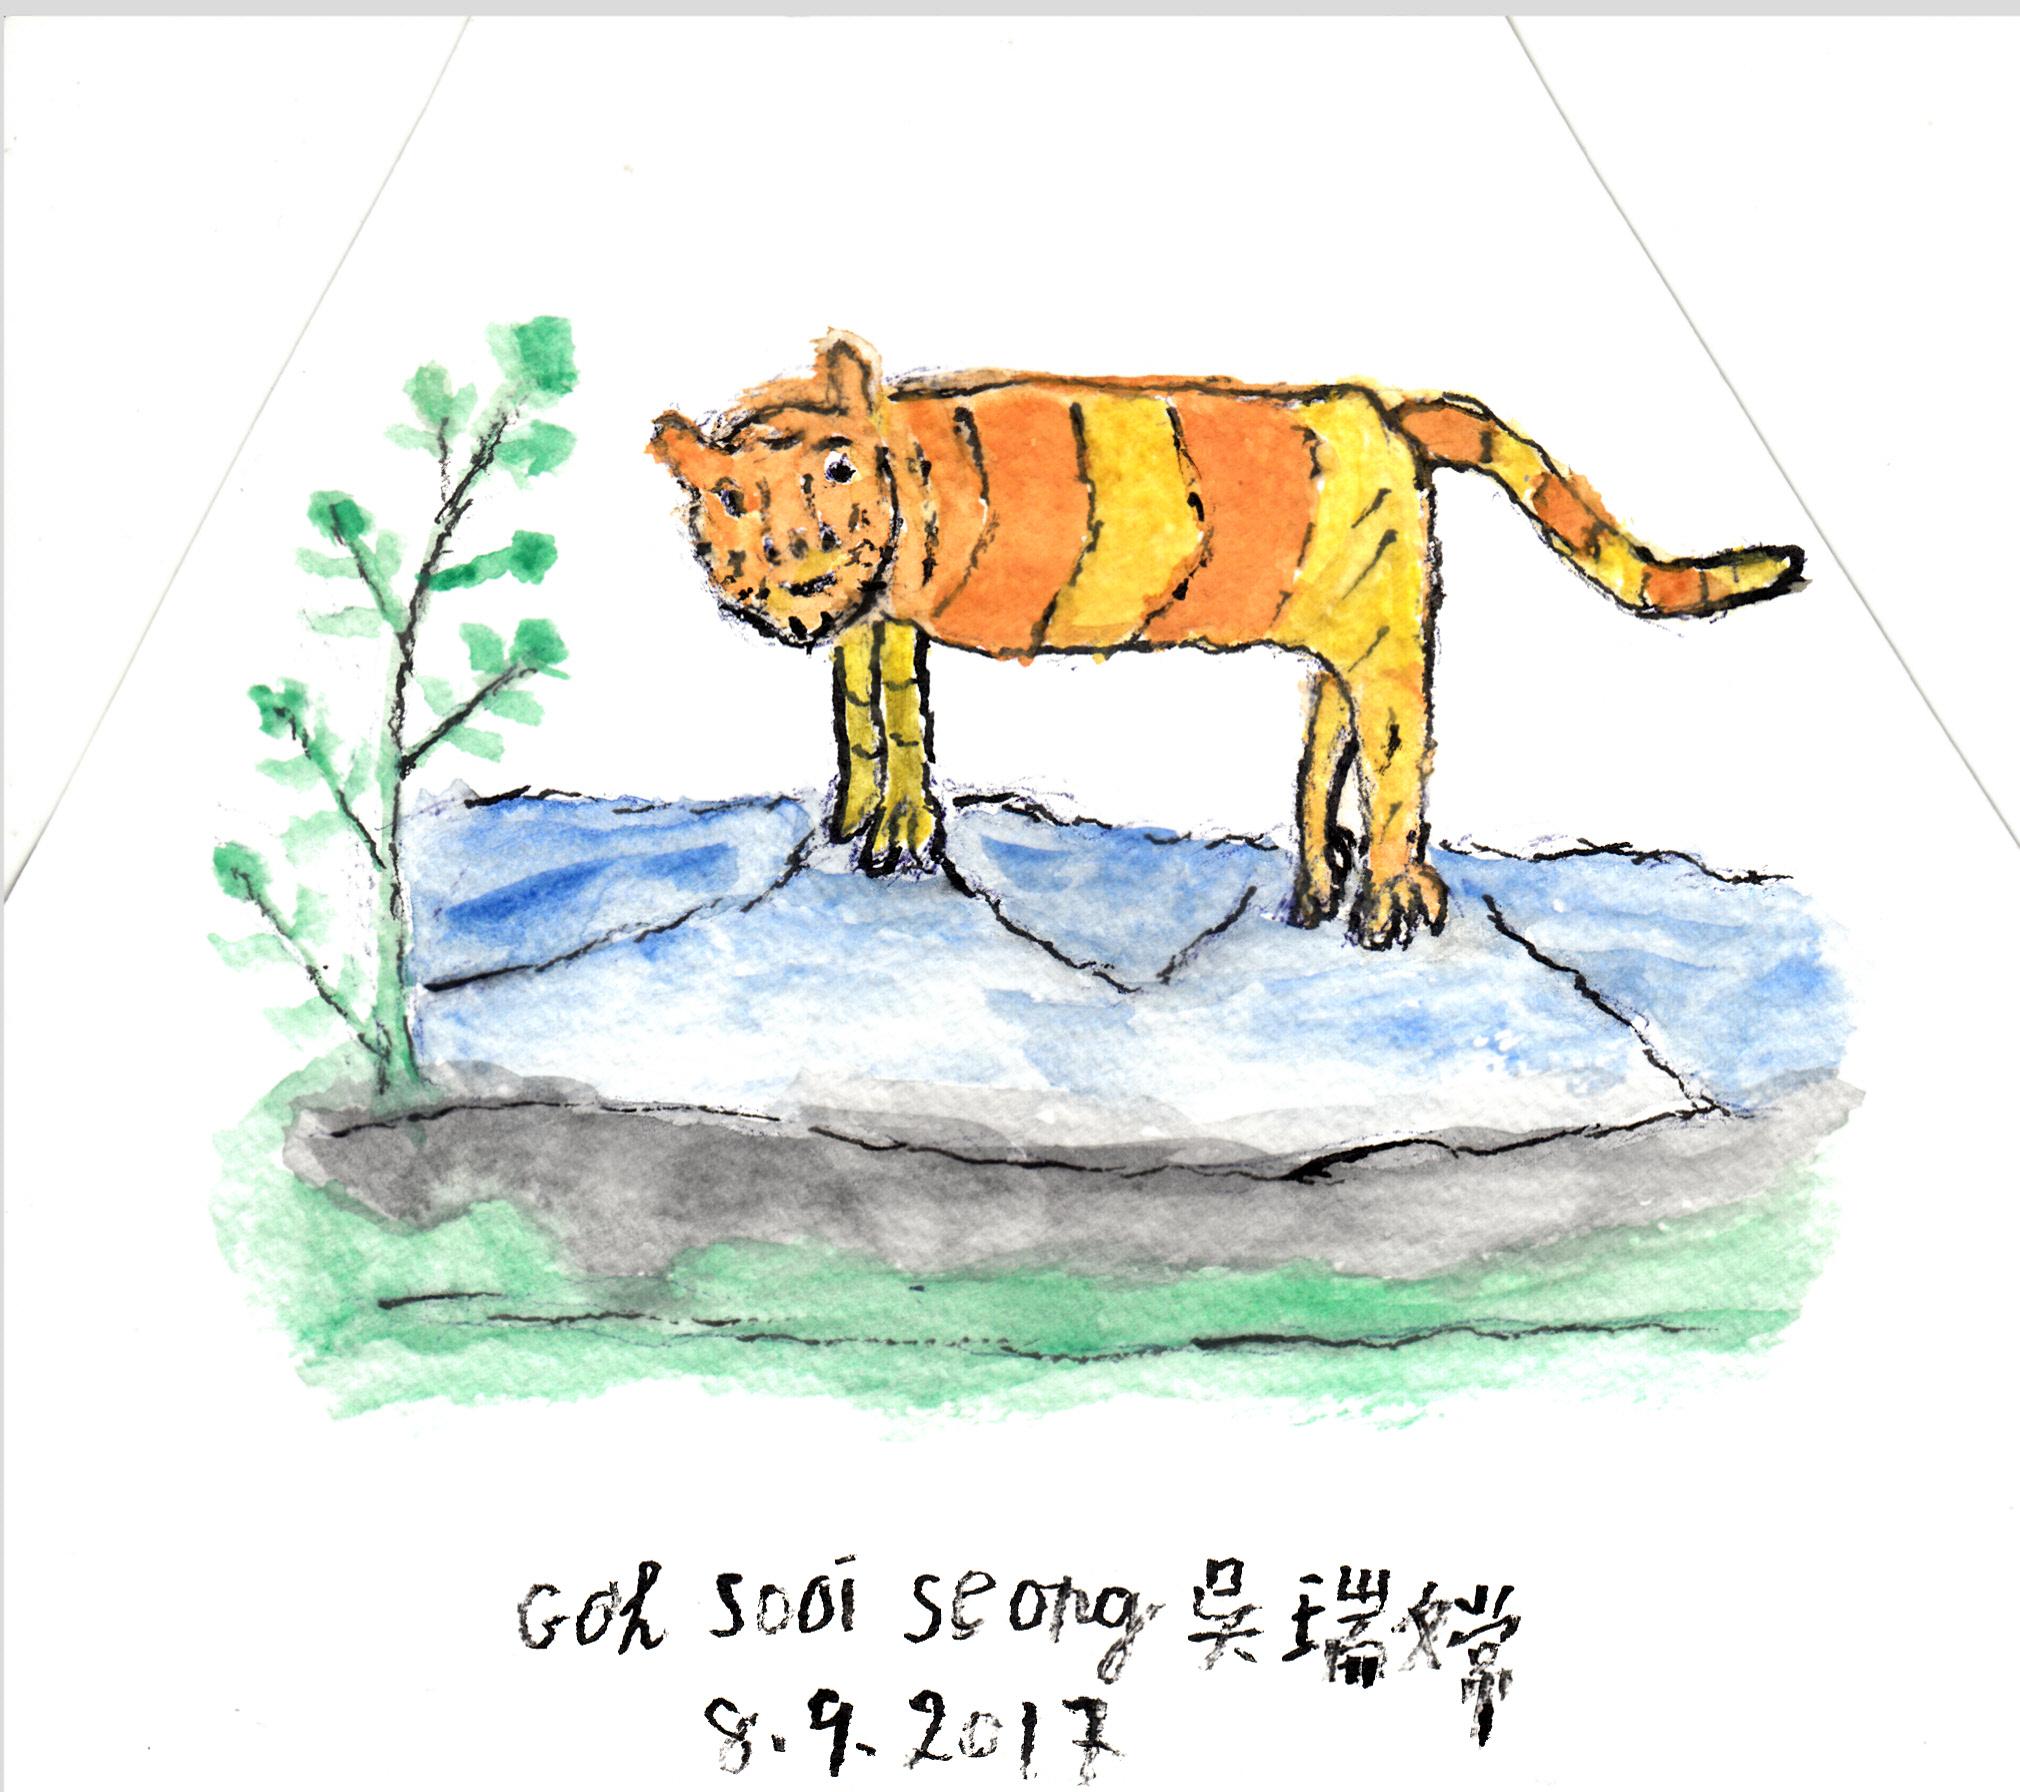 Goh Sooi Seong 22.jpg